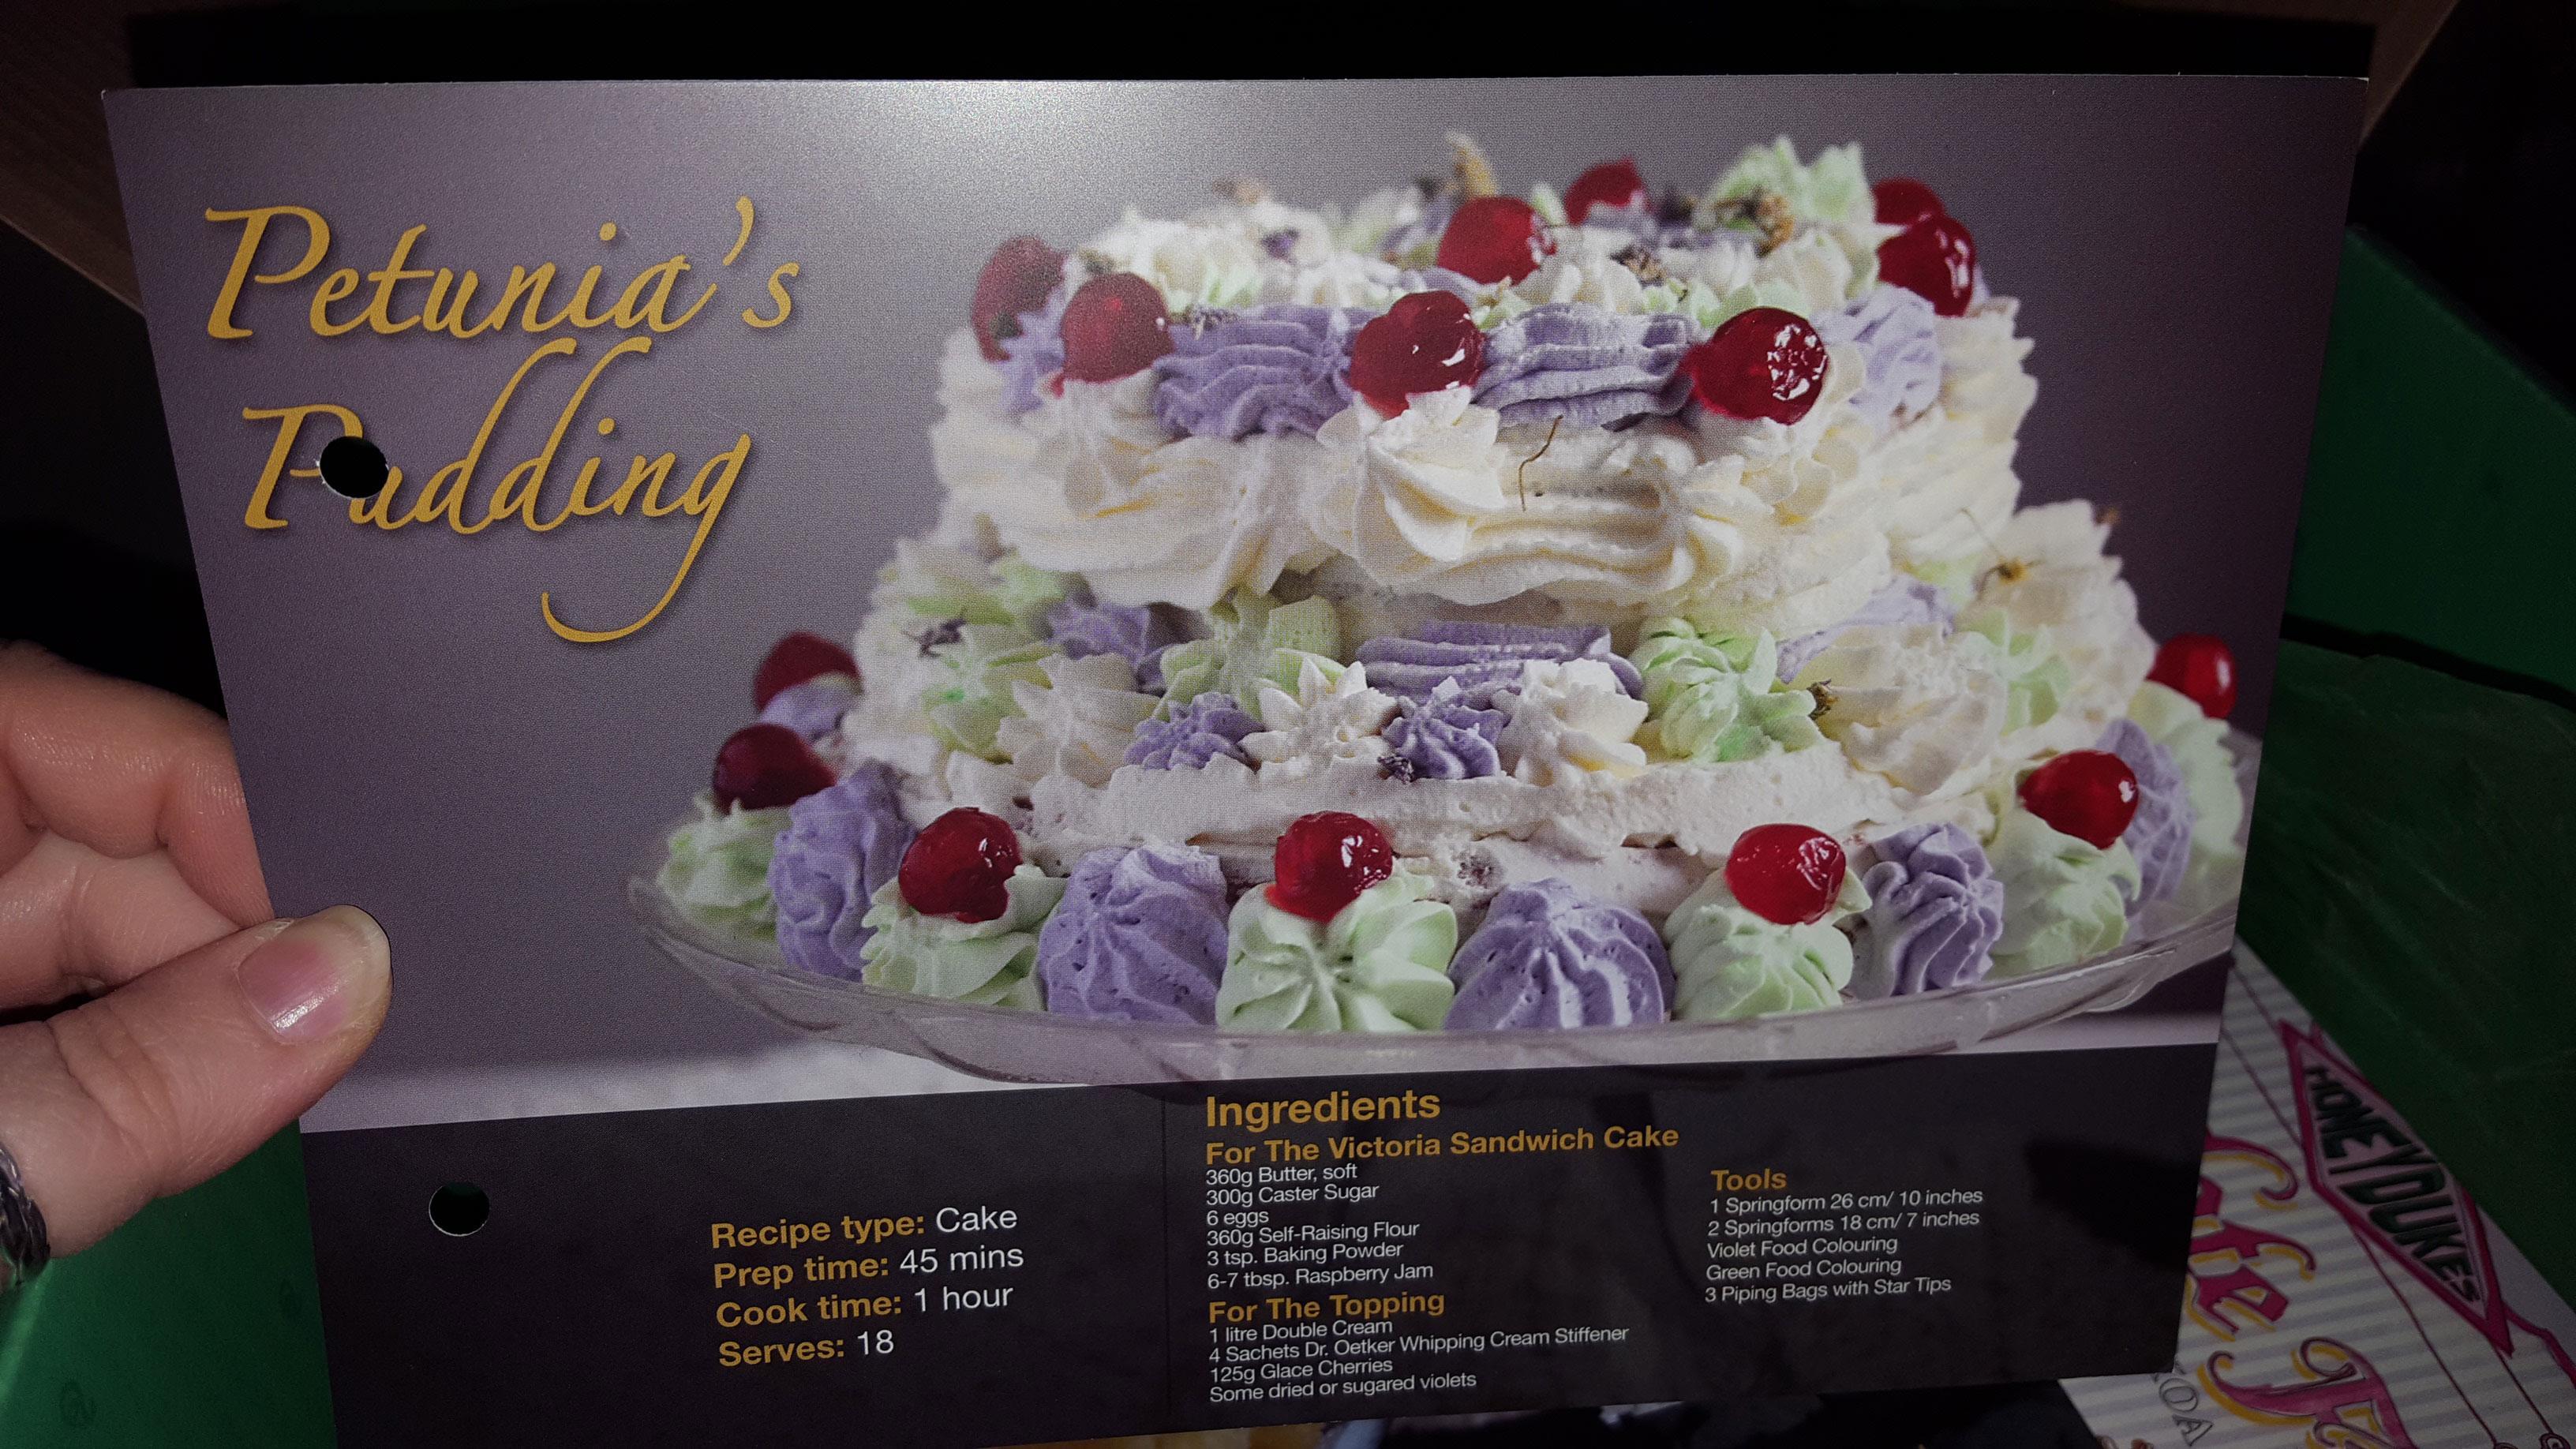 Petunia's Pudding recipe card